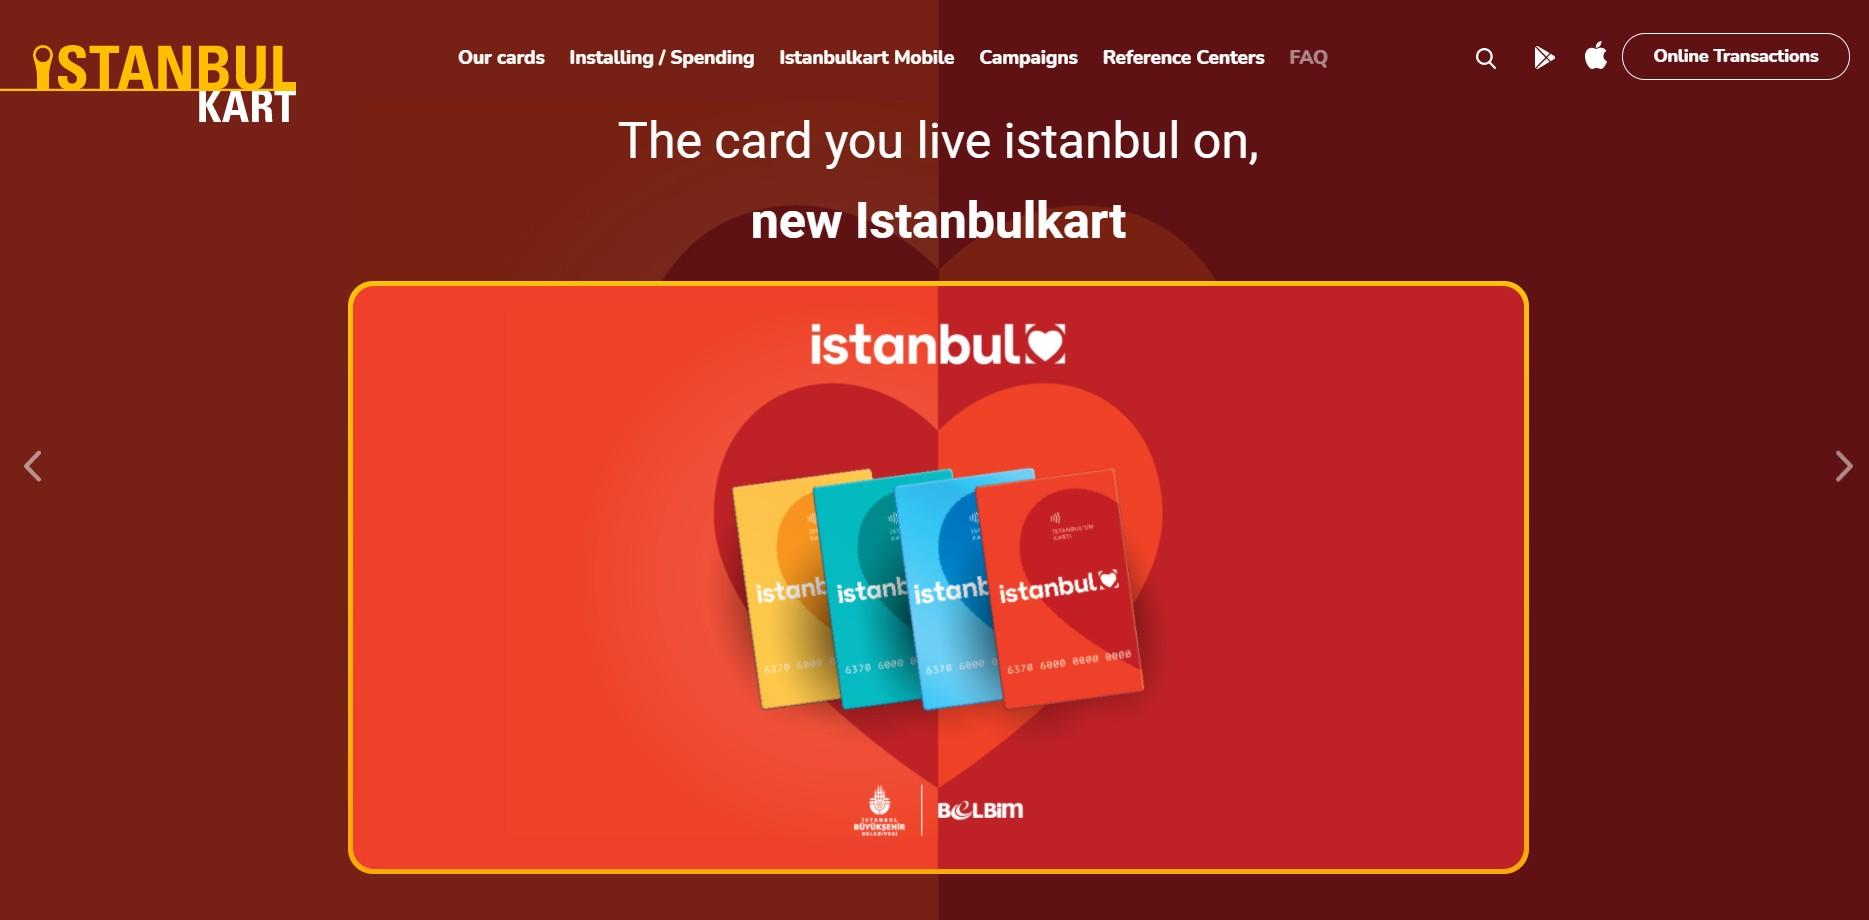 Официальный сайт Istanbulkart